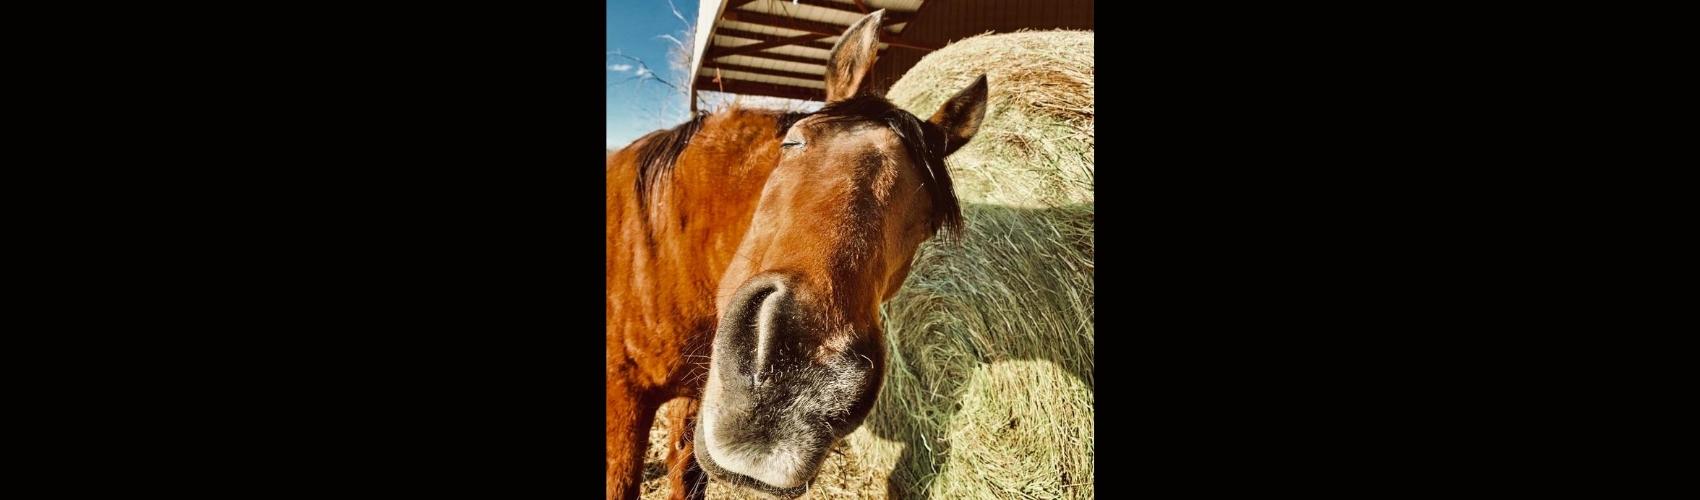 Horse Hemp - Meadow Blog Feature Image